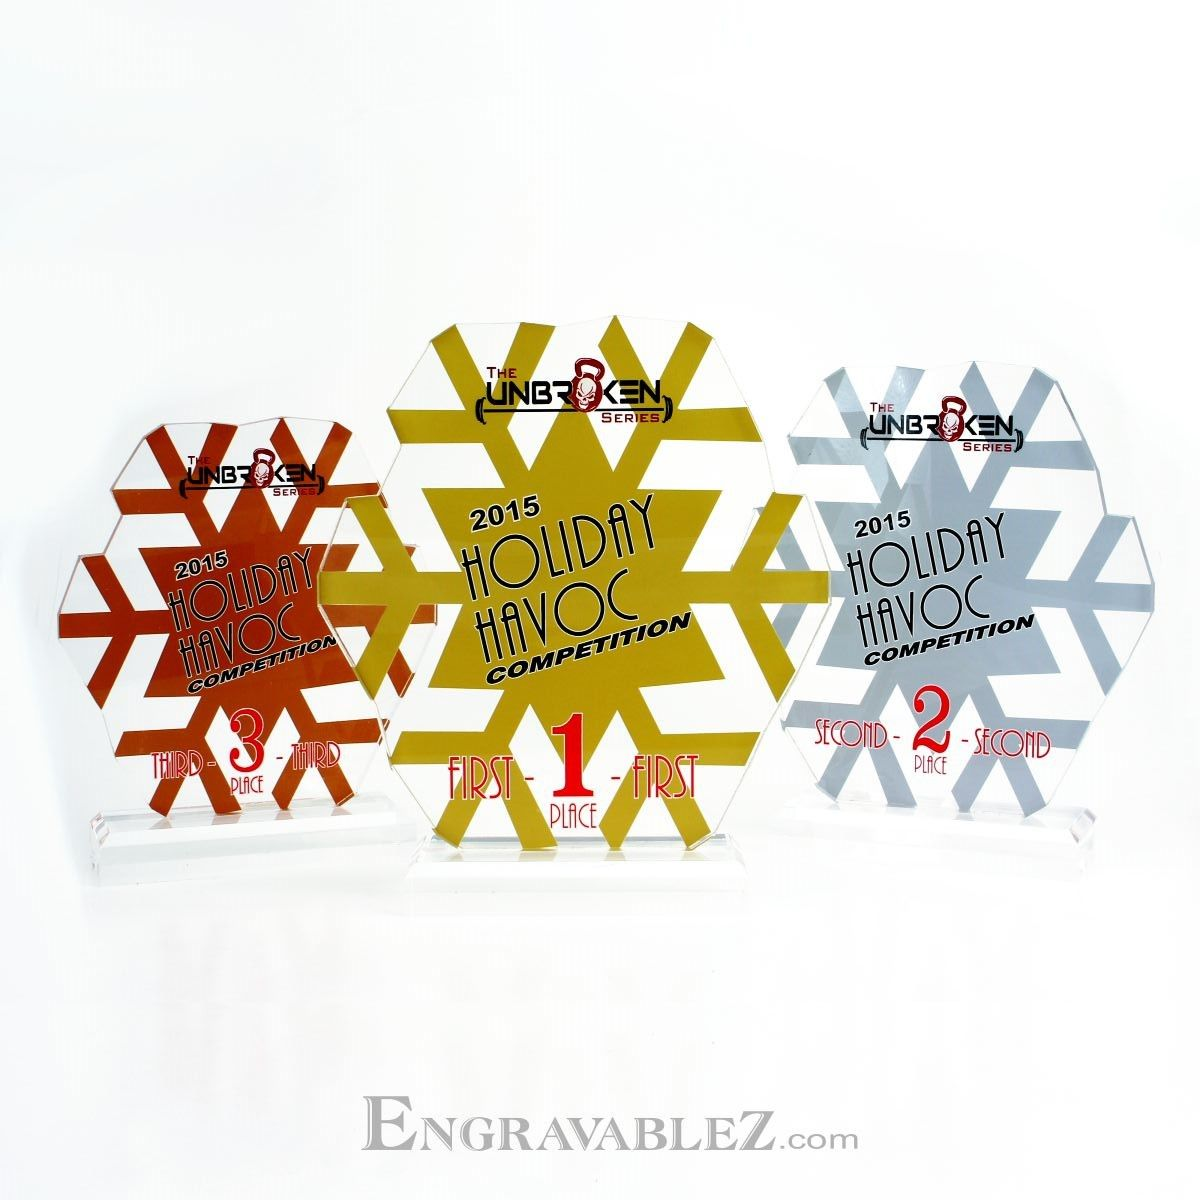 Custom Acrylic Awards for the Holiday Havoc - CrossFit Challenge #TemepTrophy (www.EngravableZ.com)